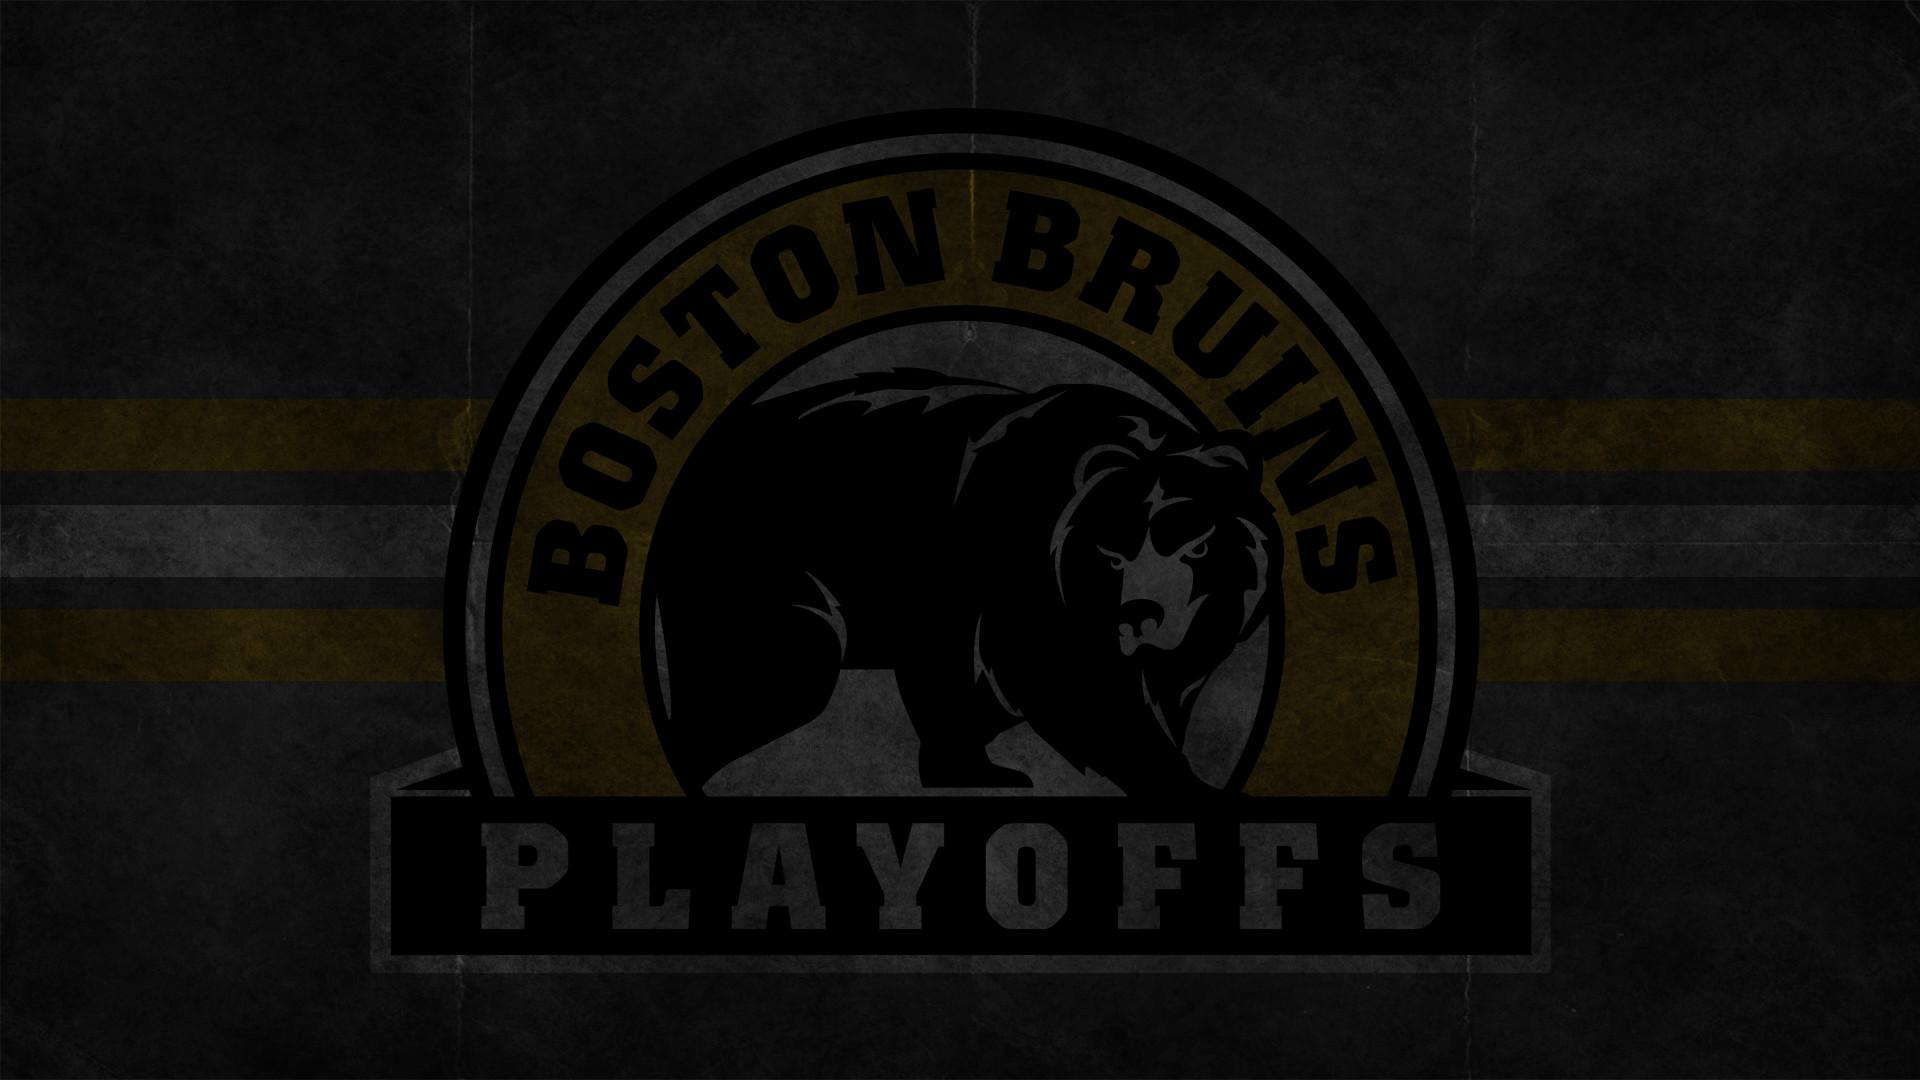 Boston Bruins Playoffs by Bruins4Life Boston Bruins Playoffs by Bruins4Life